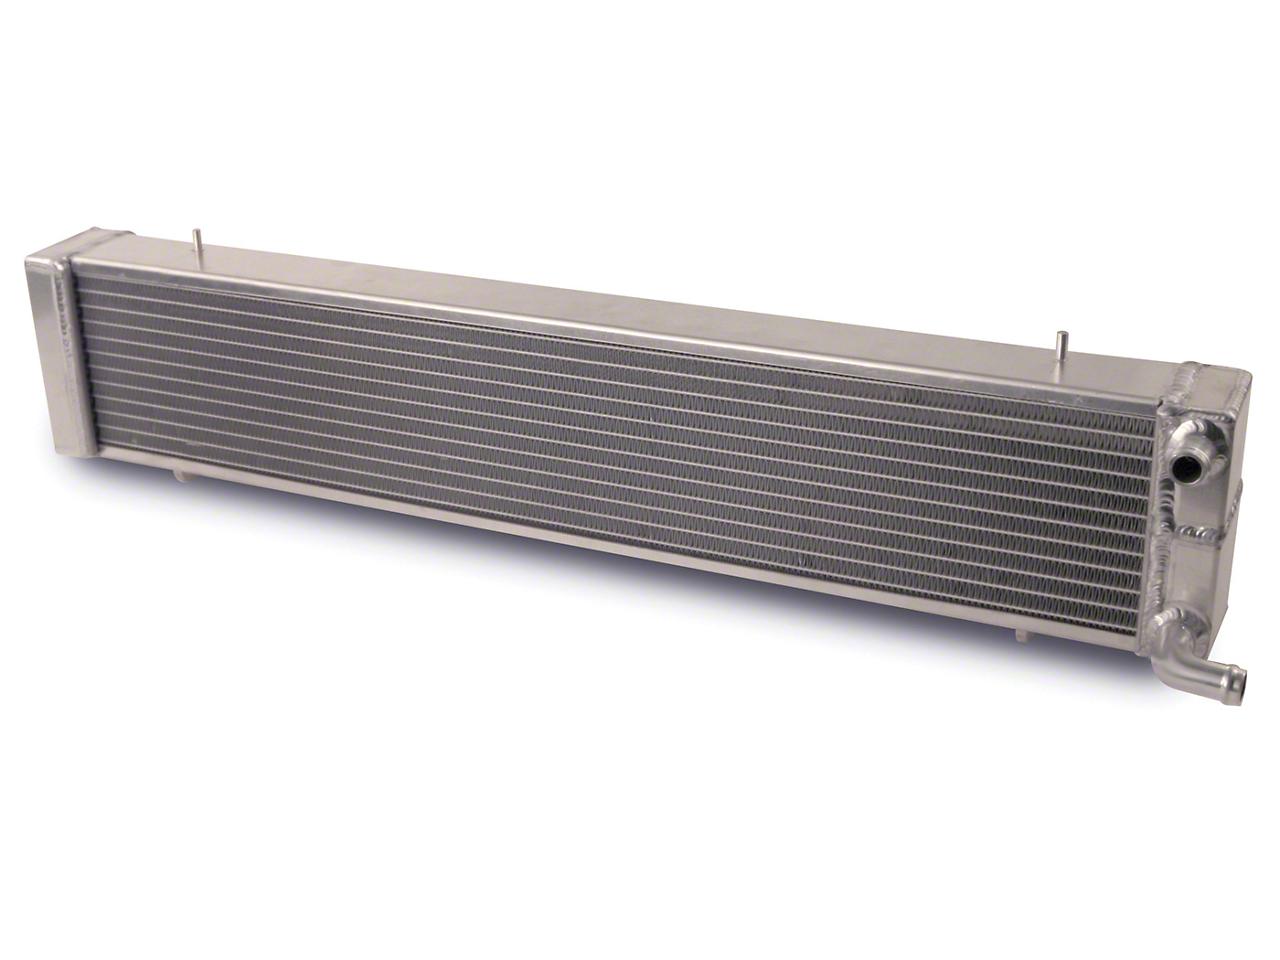 AFCO Double Pass Heat Exchanger (03-04 Cobra)